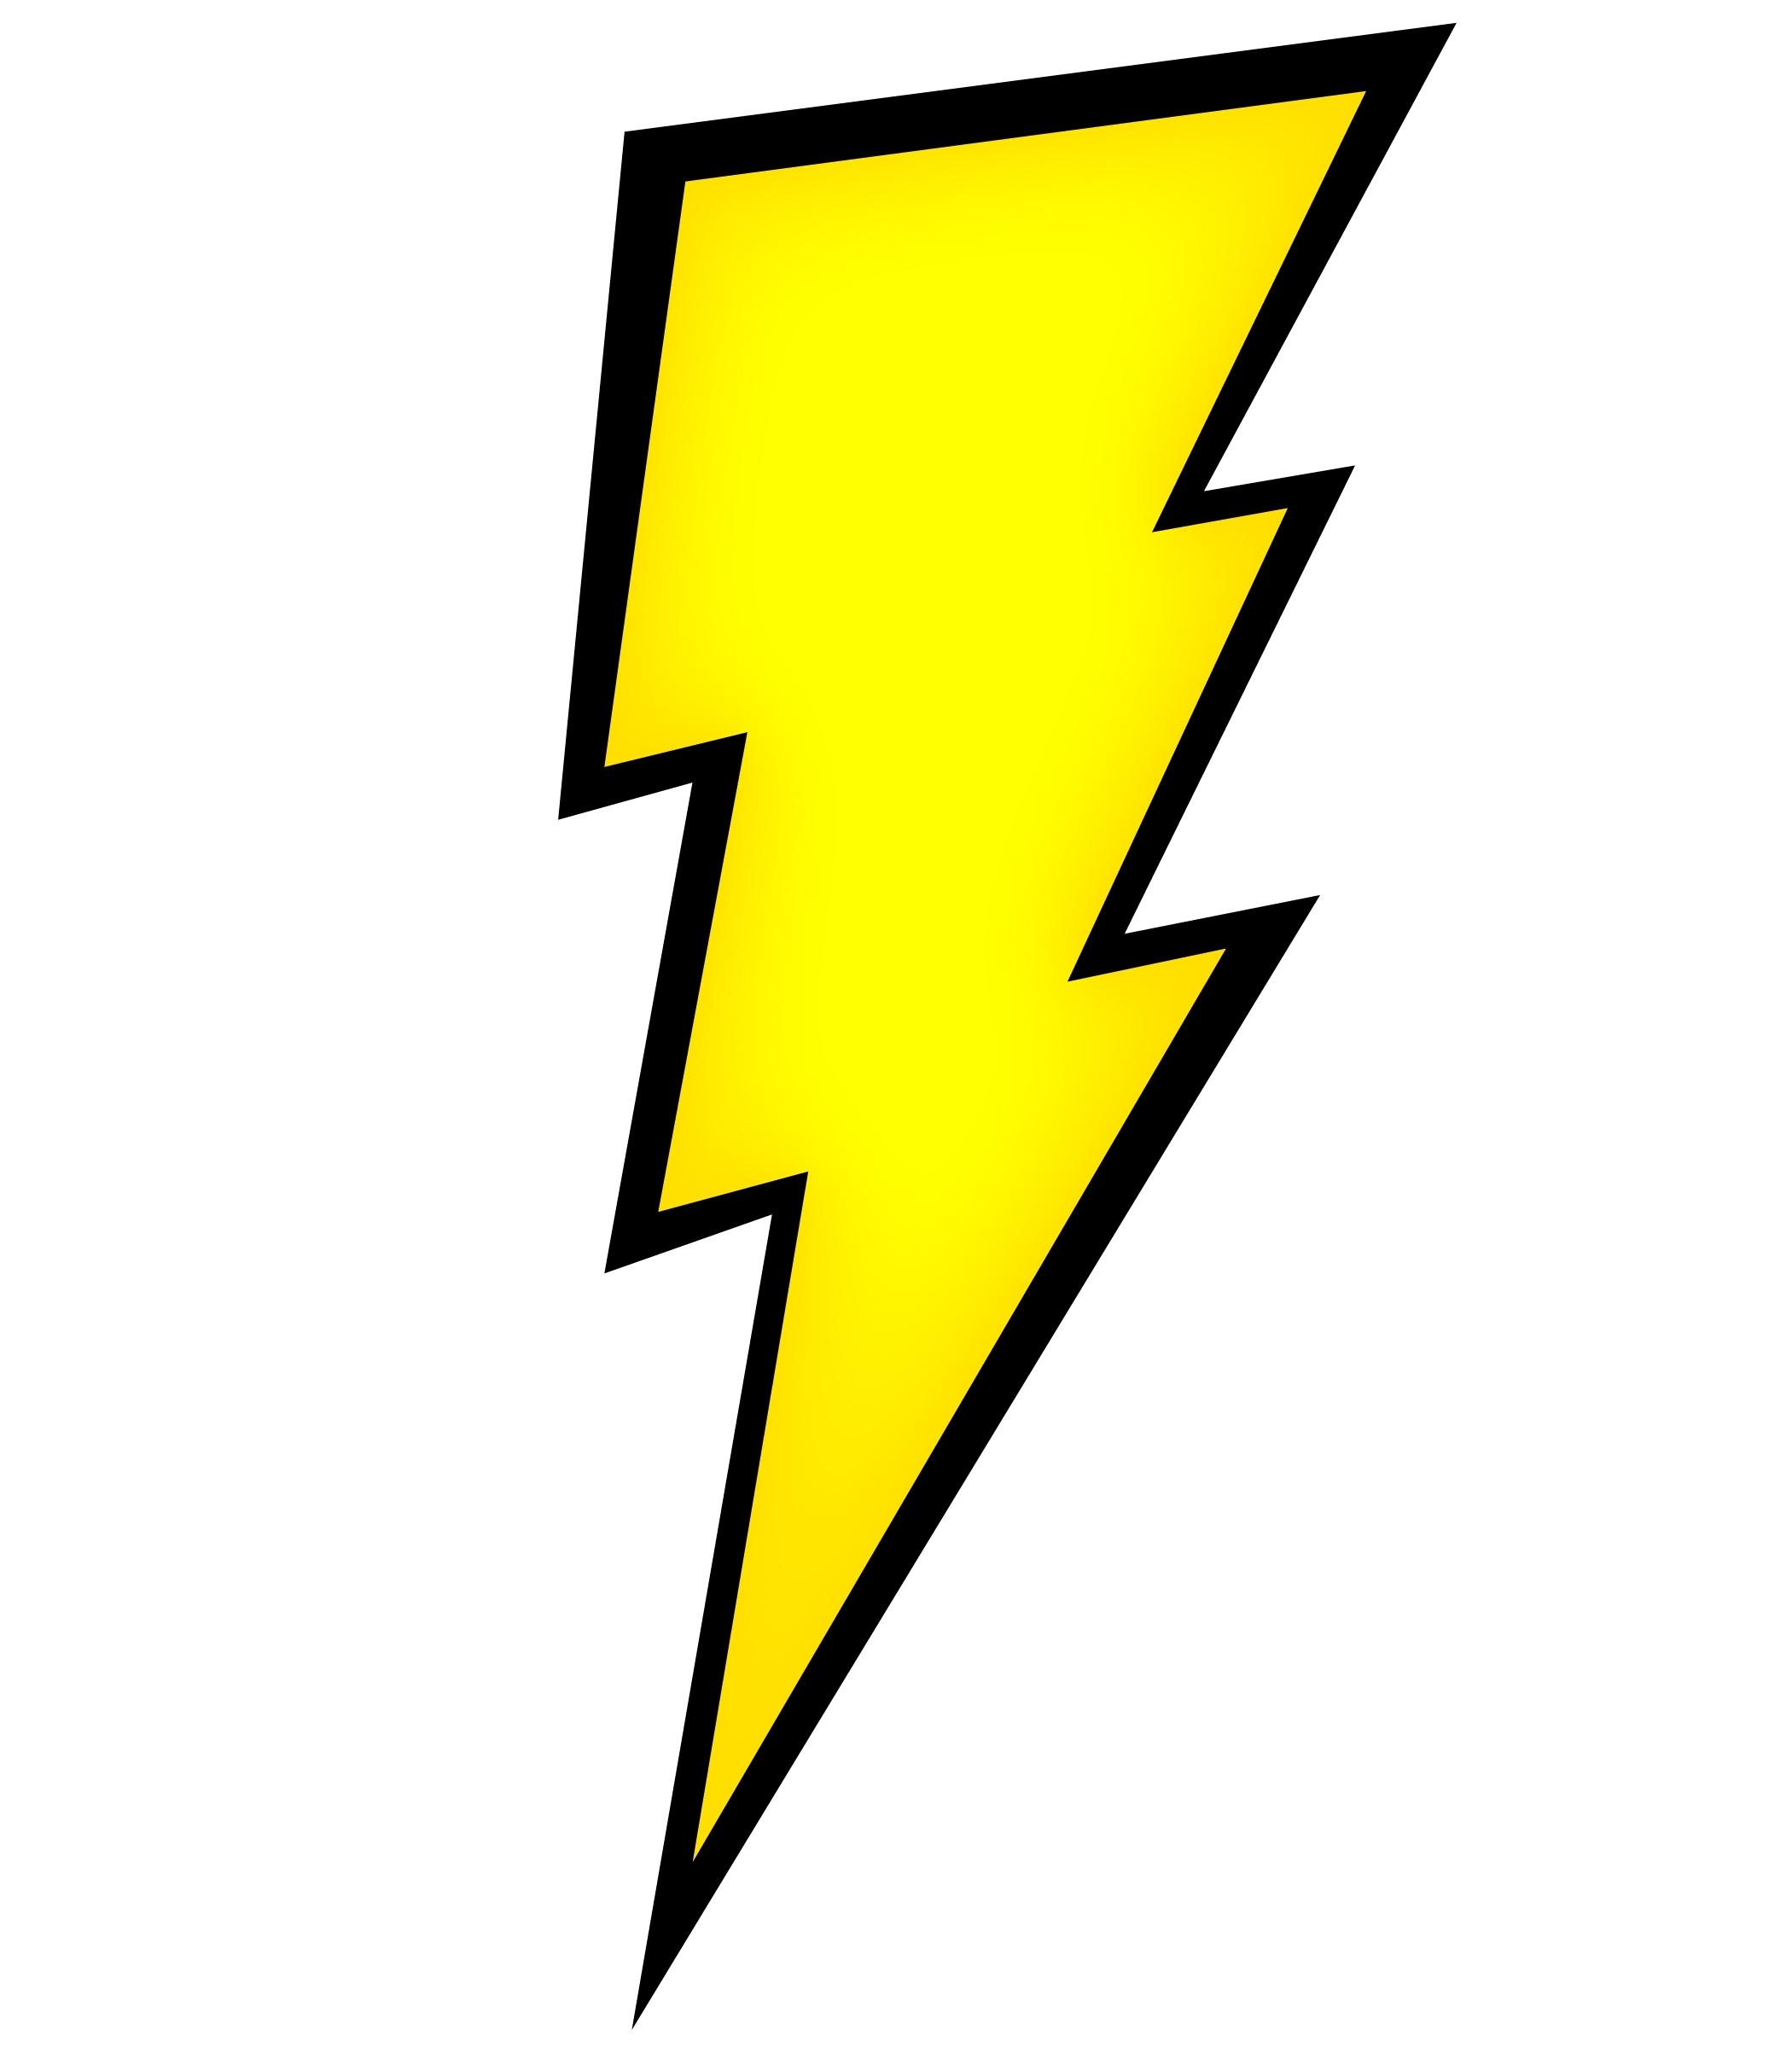 Free Lightning Flash, Download Free Clip Art, Free Clip Art.